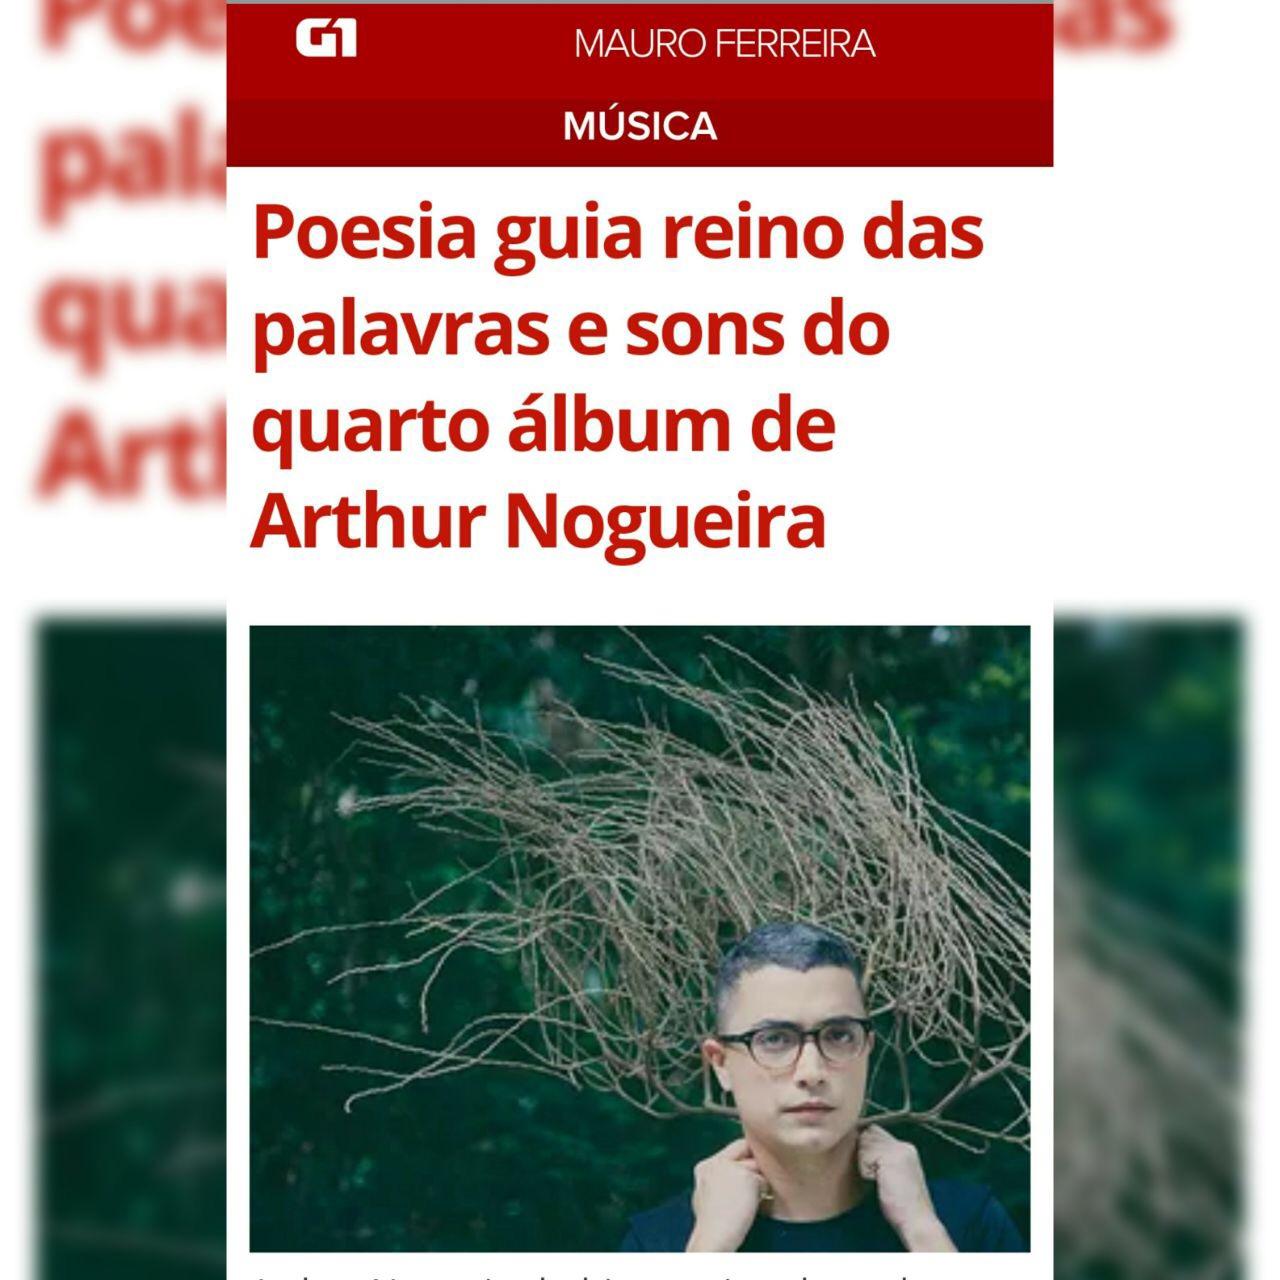 G1 - Mauro Ferreira